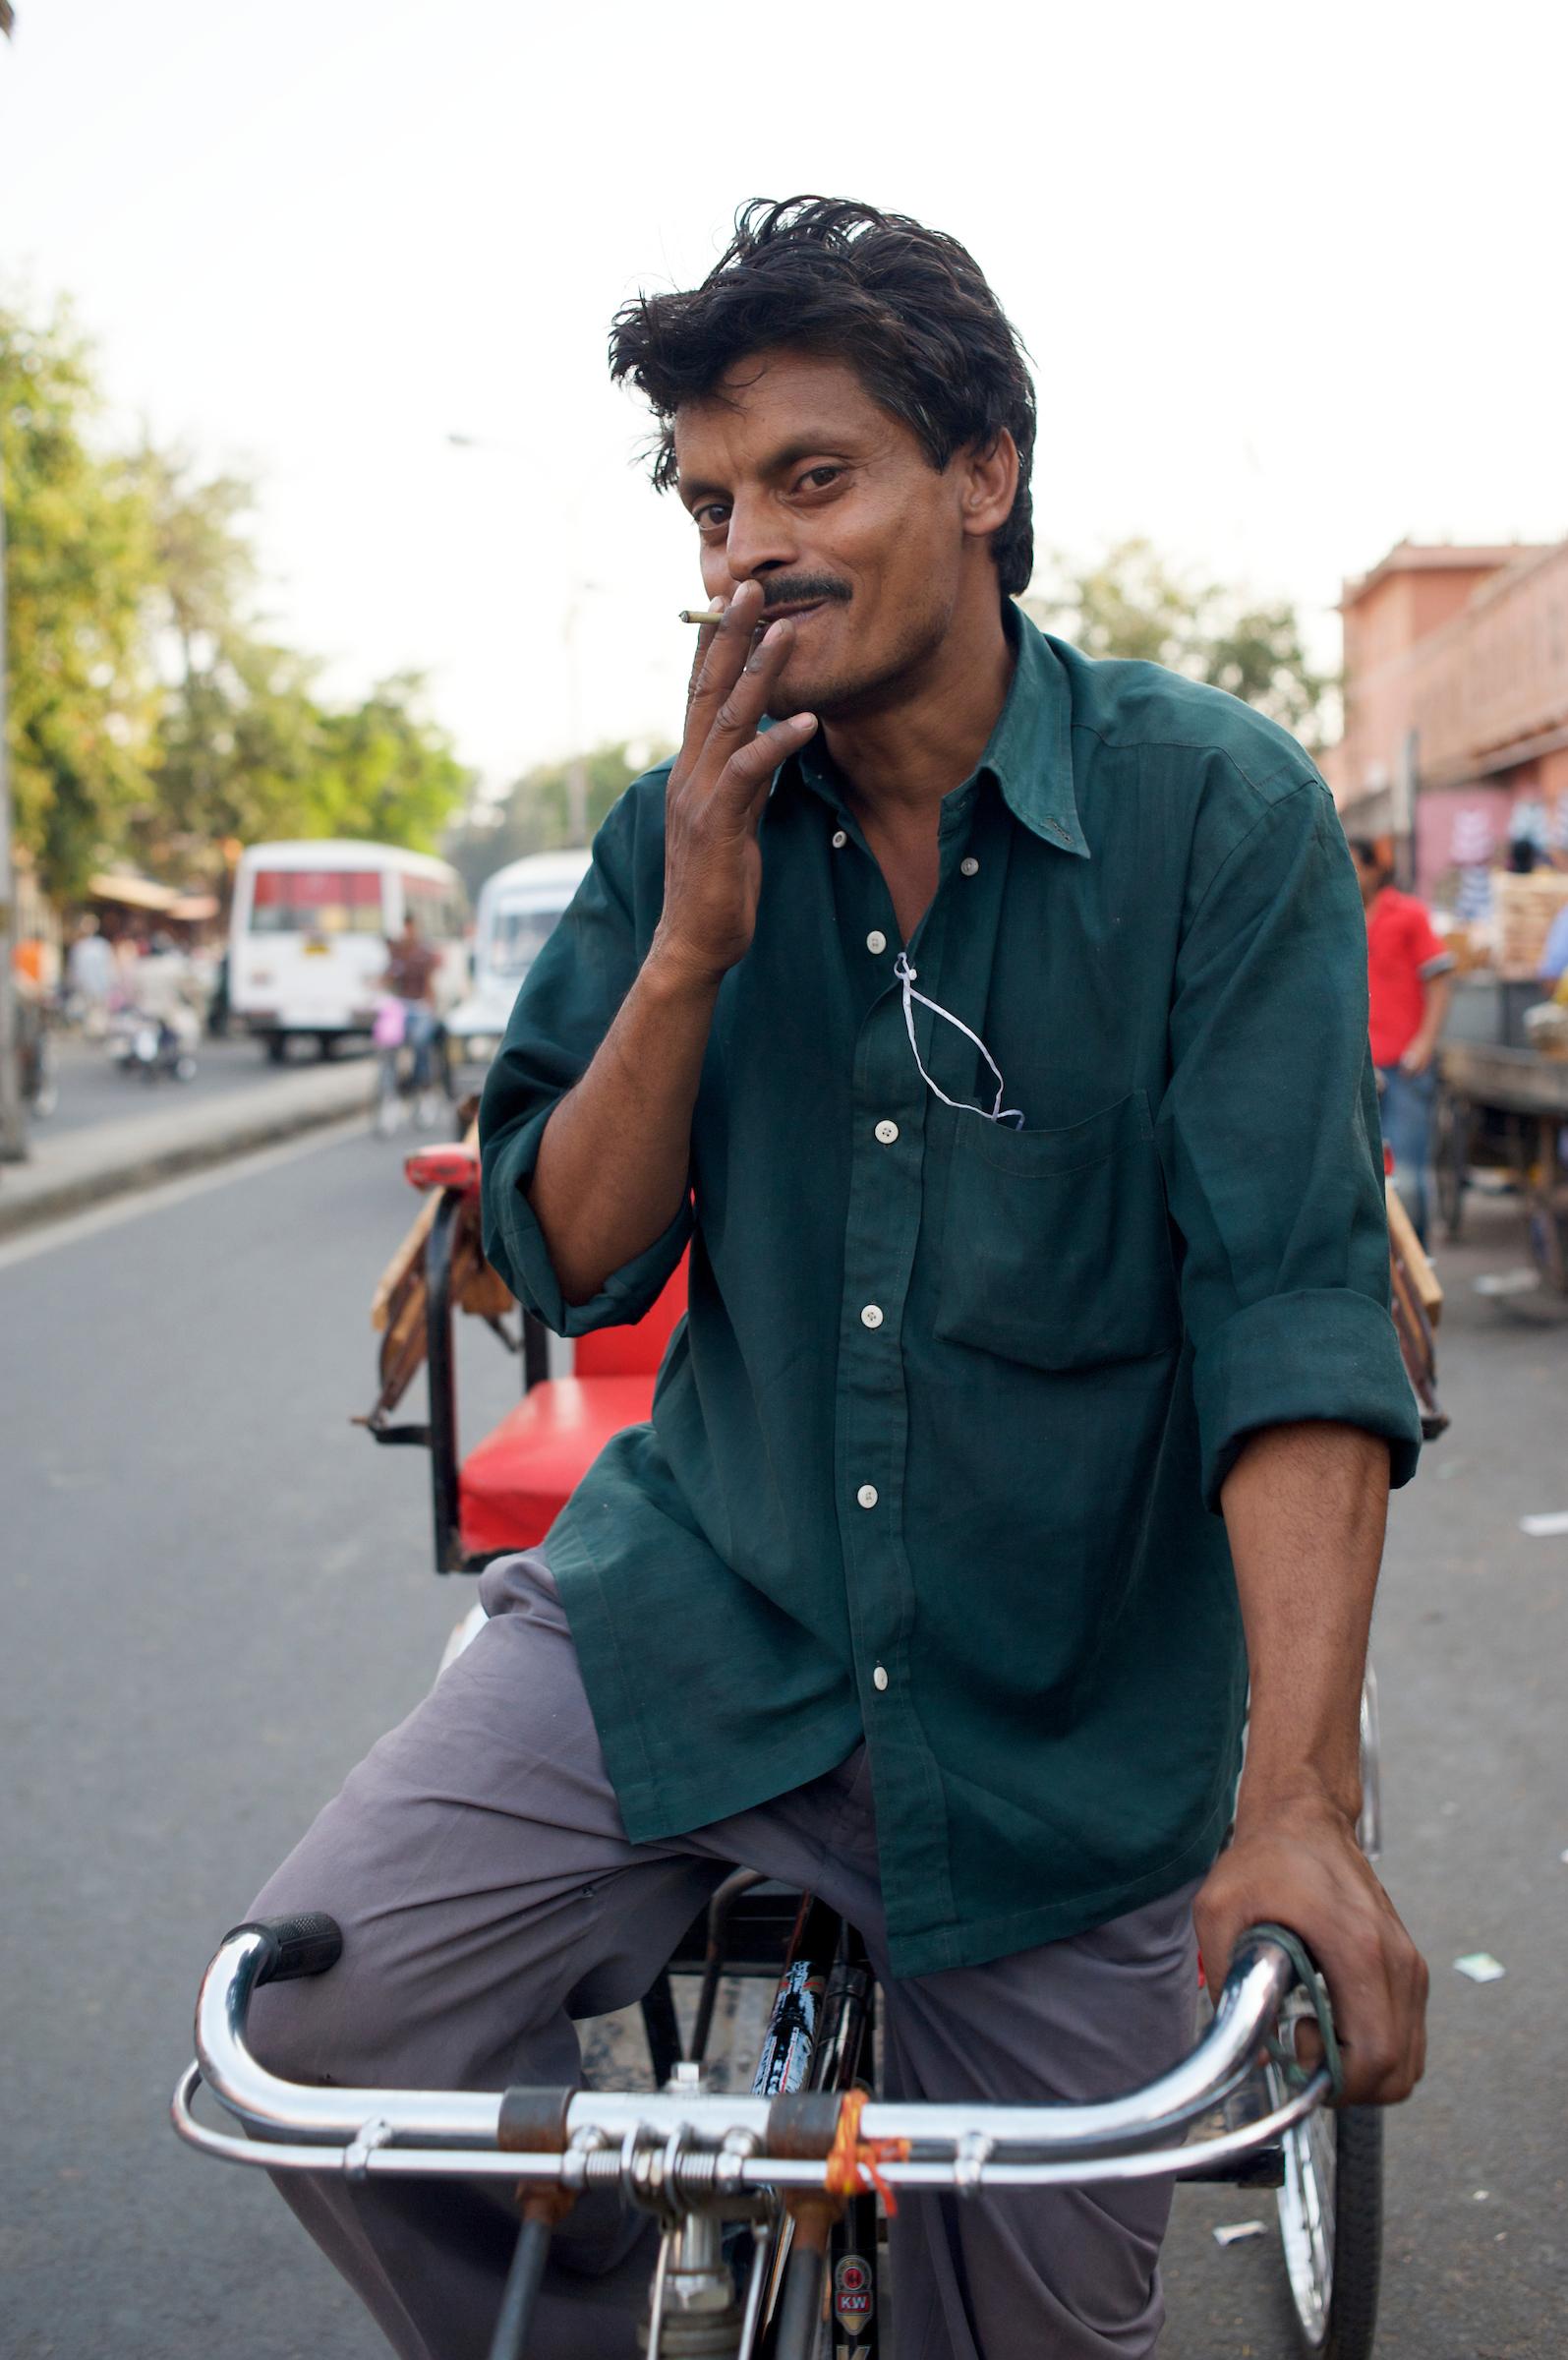 Rickshaw Wallah and tourist hawker - Jaipur, India